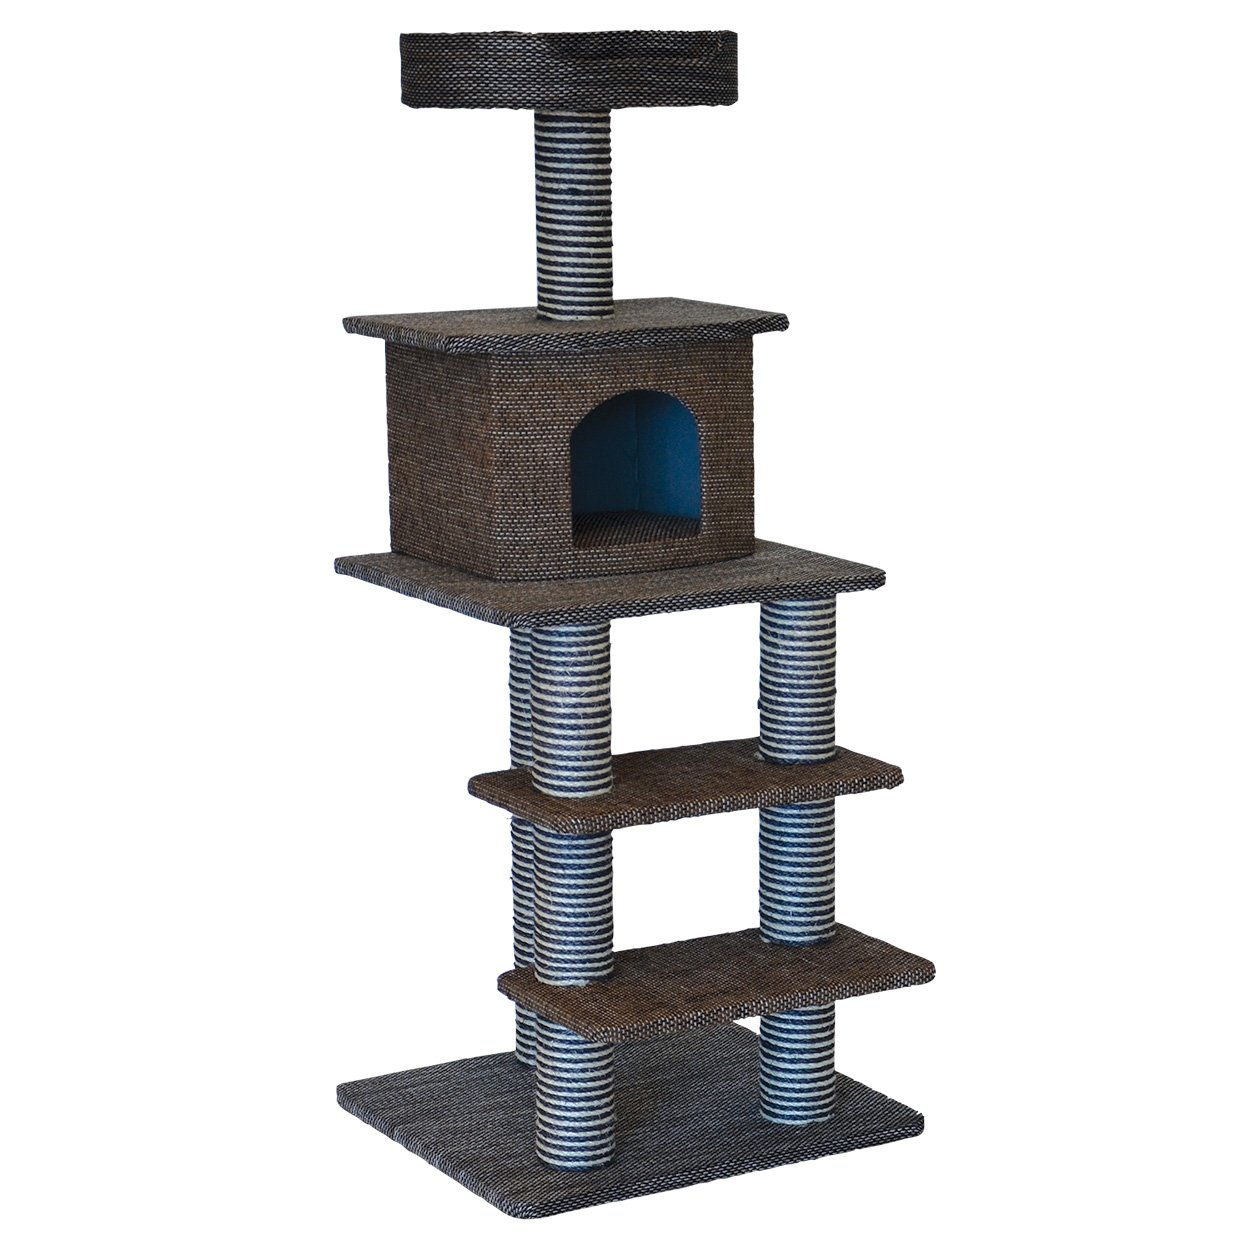 Animal Treasures 14853 Cat Tree Multi Level Scratcher, 51